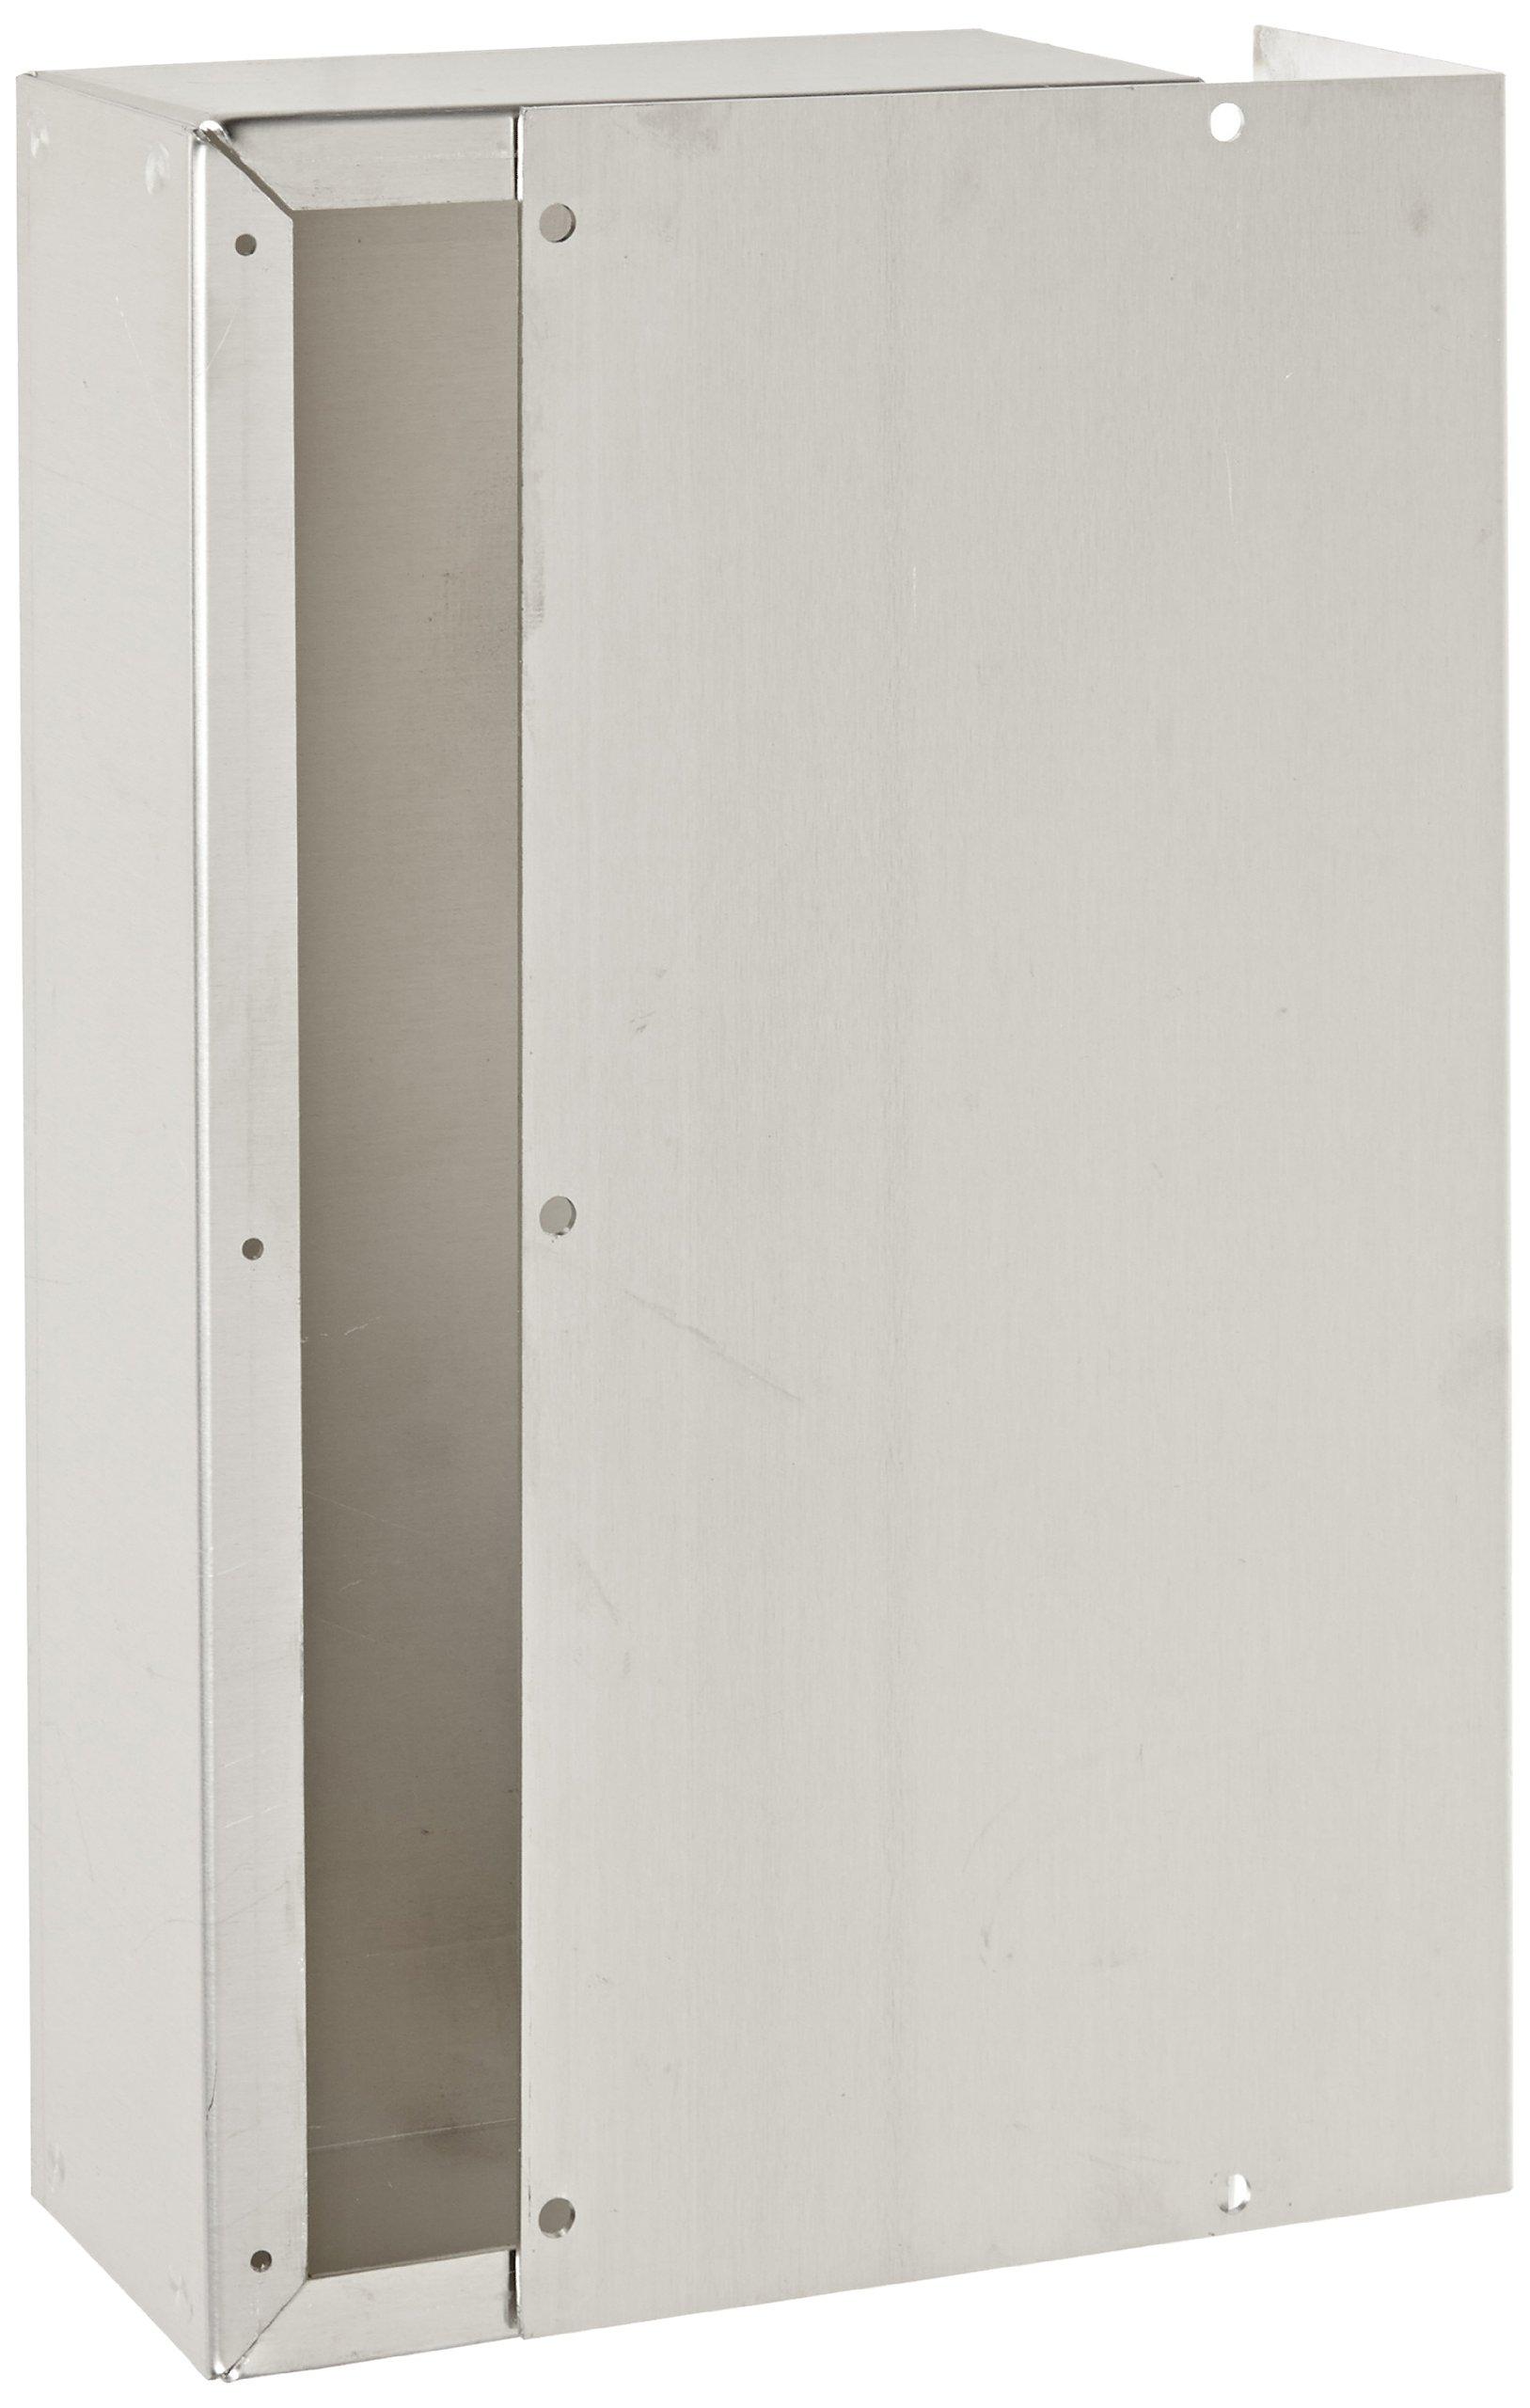 BUD Industries CU-622-A Aluminum Converter Box, 12'' Width x 2-1/2 Height x 6'' Depth, Natural Finish